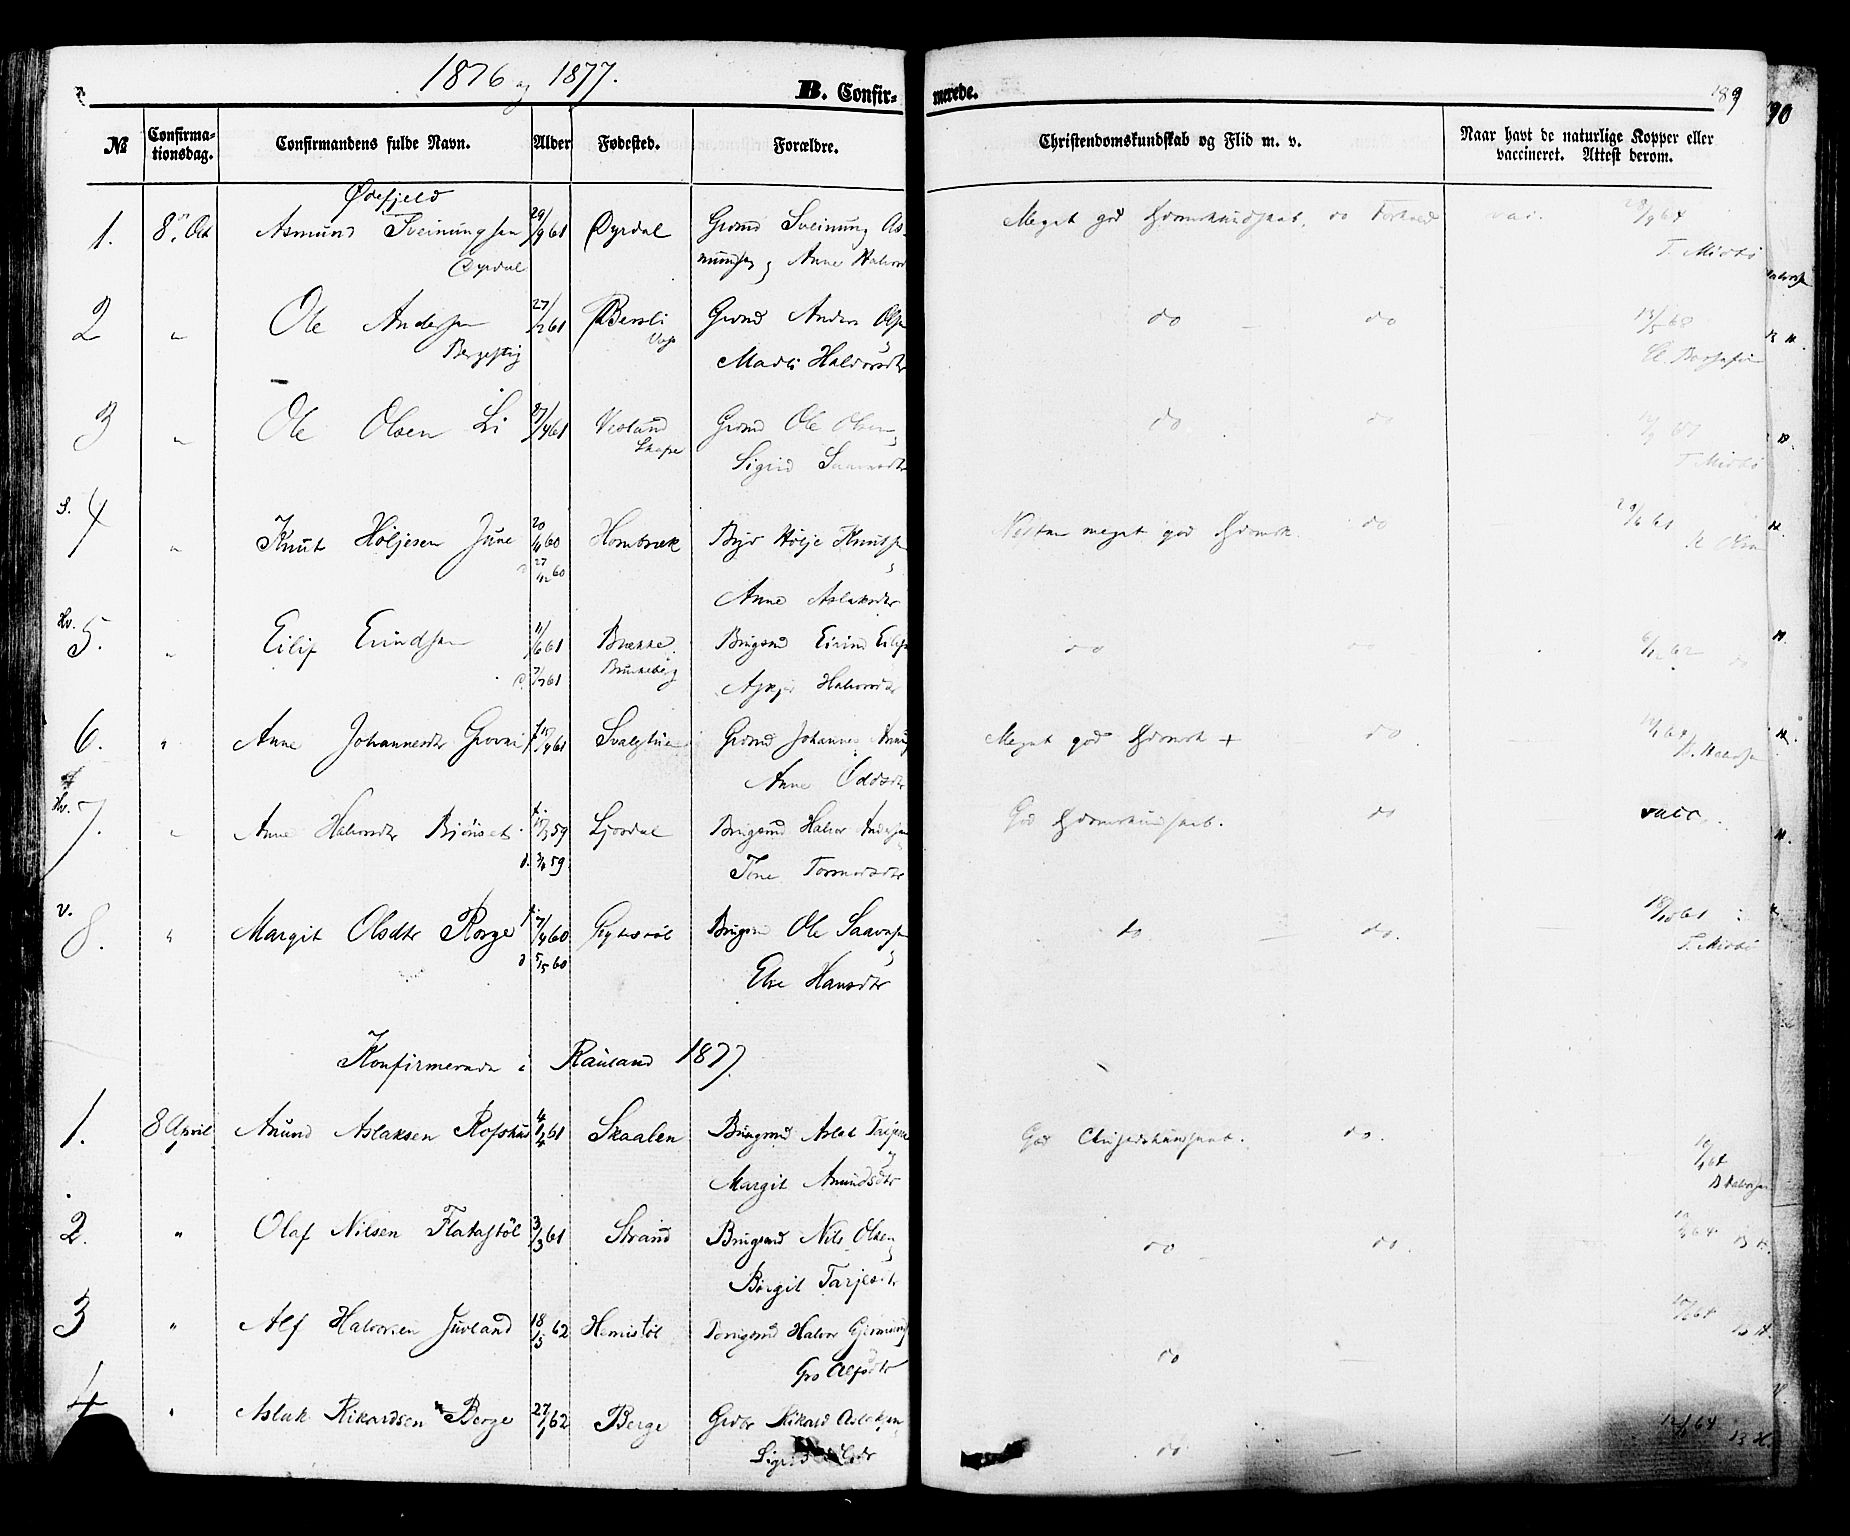 SAKO, Rauland kirkebøker, F/Fa/L0003: Ministerialbok nr. 3, 1859-1886, s. 189